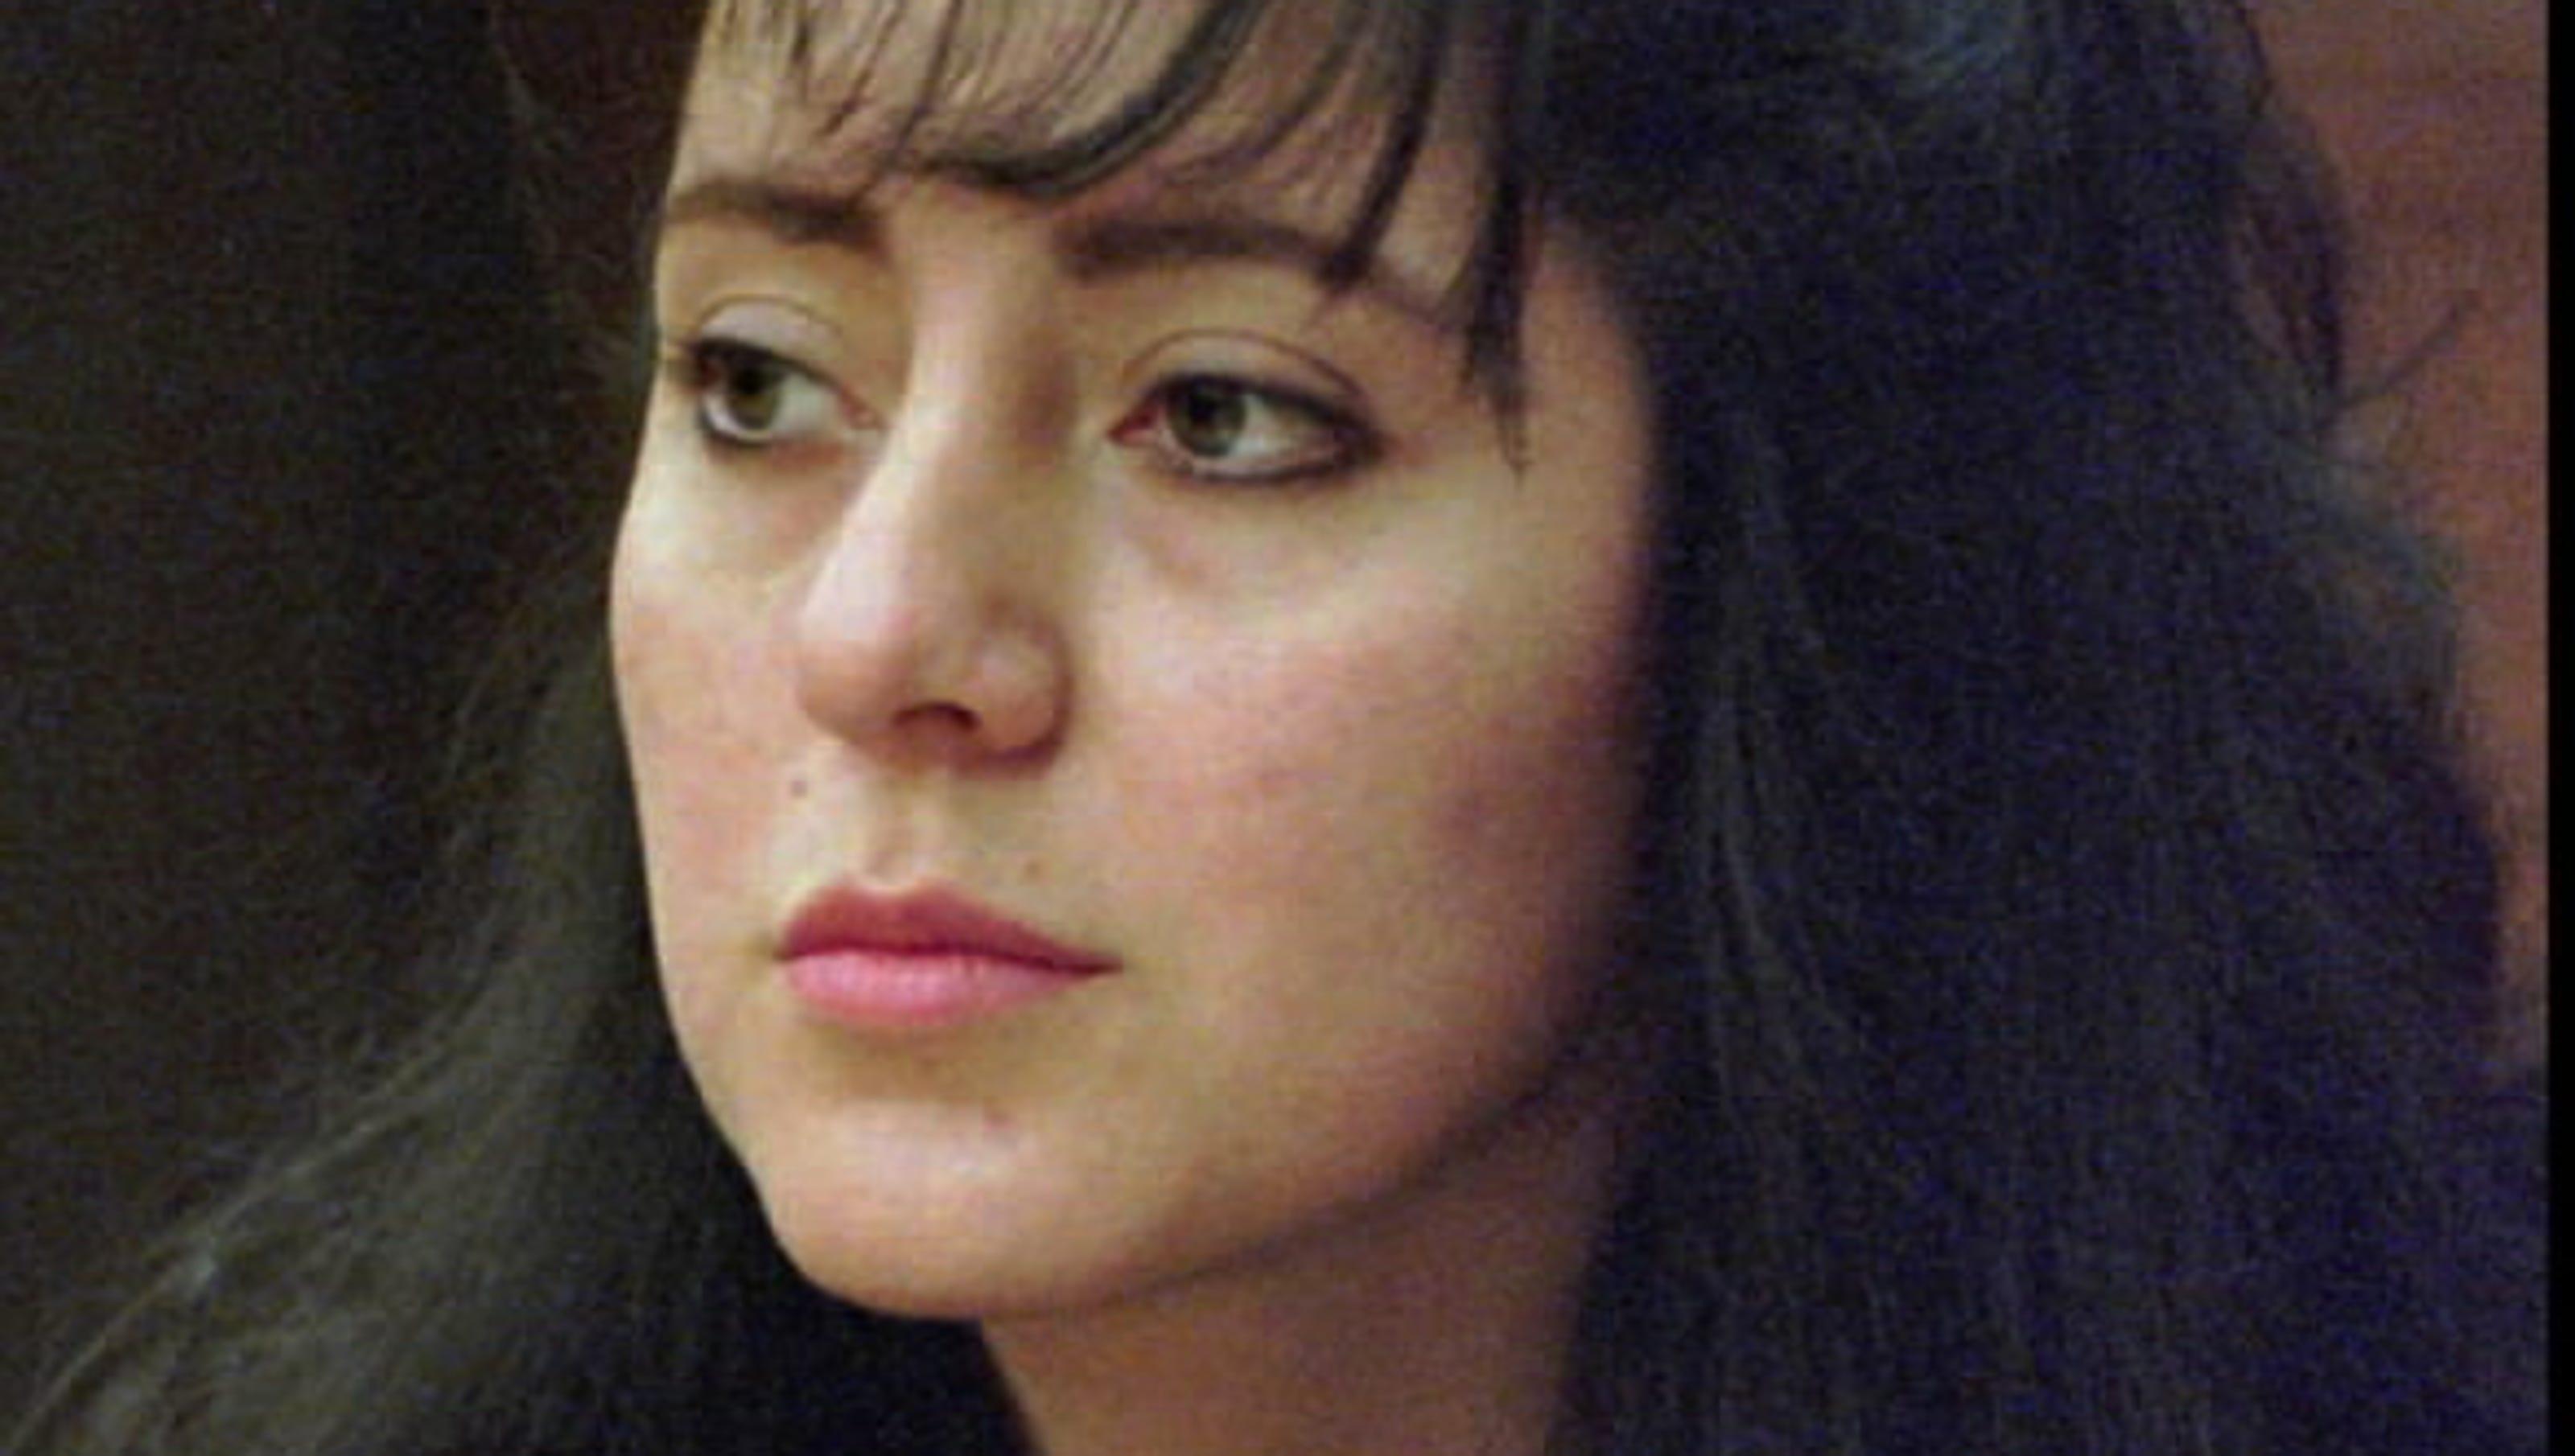 Lorena Bobbitt: Lorena Bobbitt Gallo Coming To Knoxville To Speak On